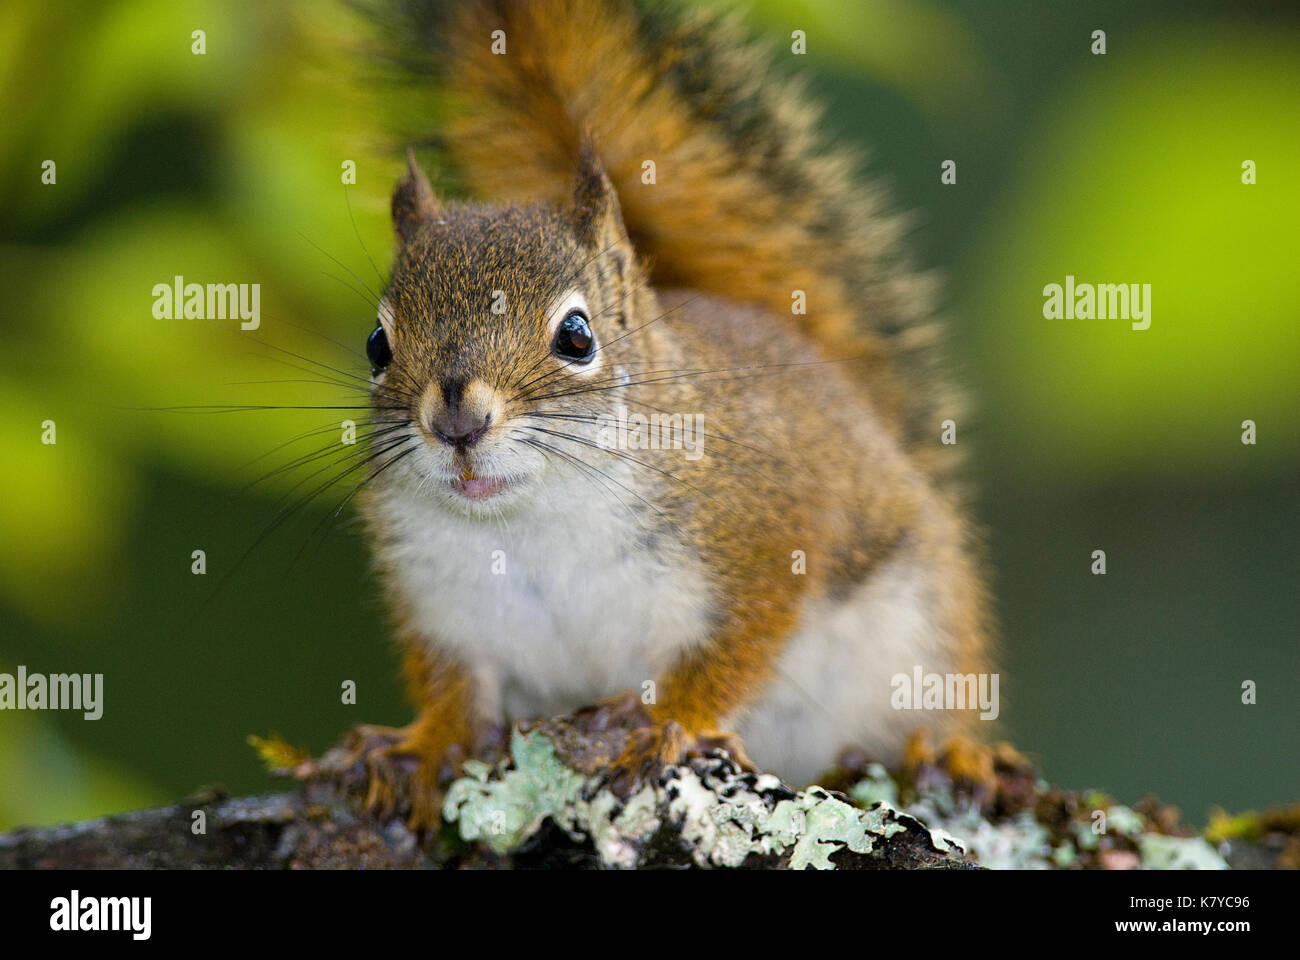 American red squirrel (Tamiasciurus hudsonicus), Tongass National Forest, Alaska, USA - Stock Image